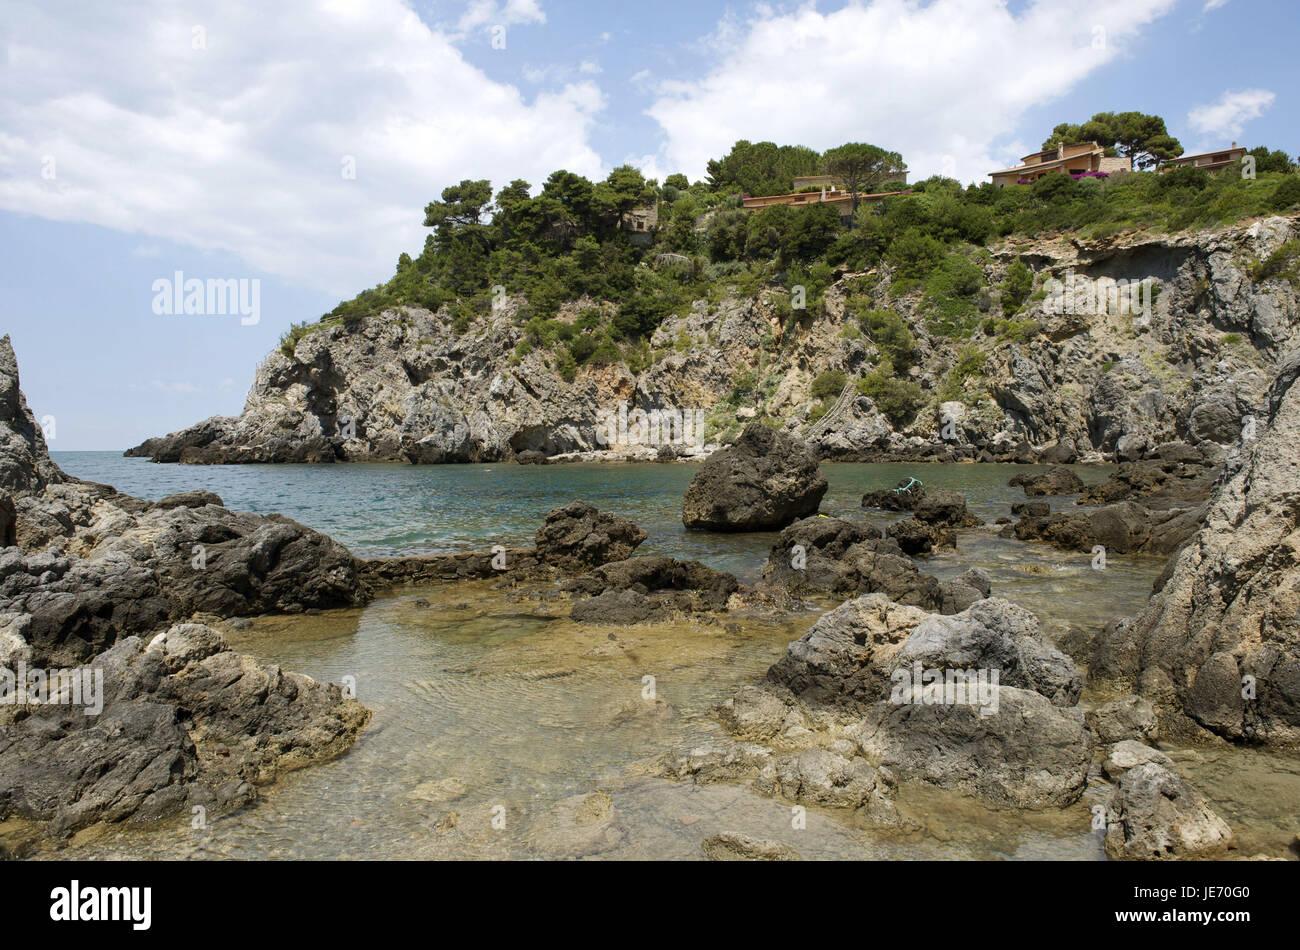 Italy, Tuscany, La Maremma, Talamone, bile coast, - Stock Image